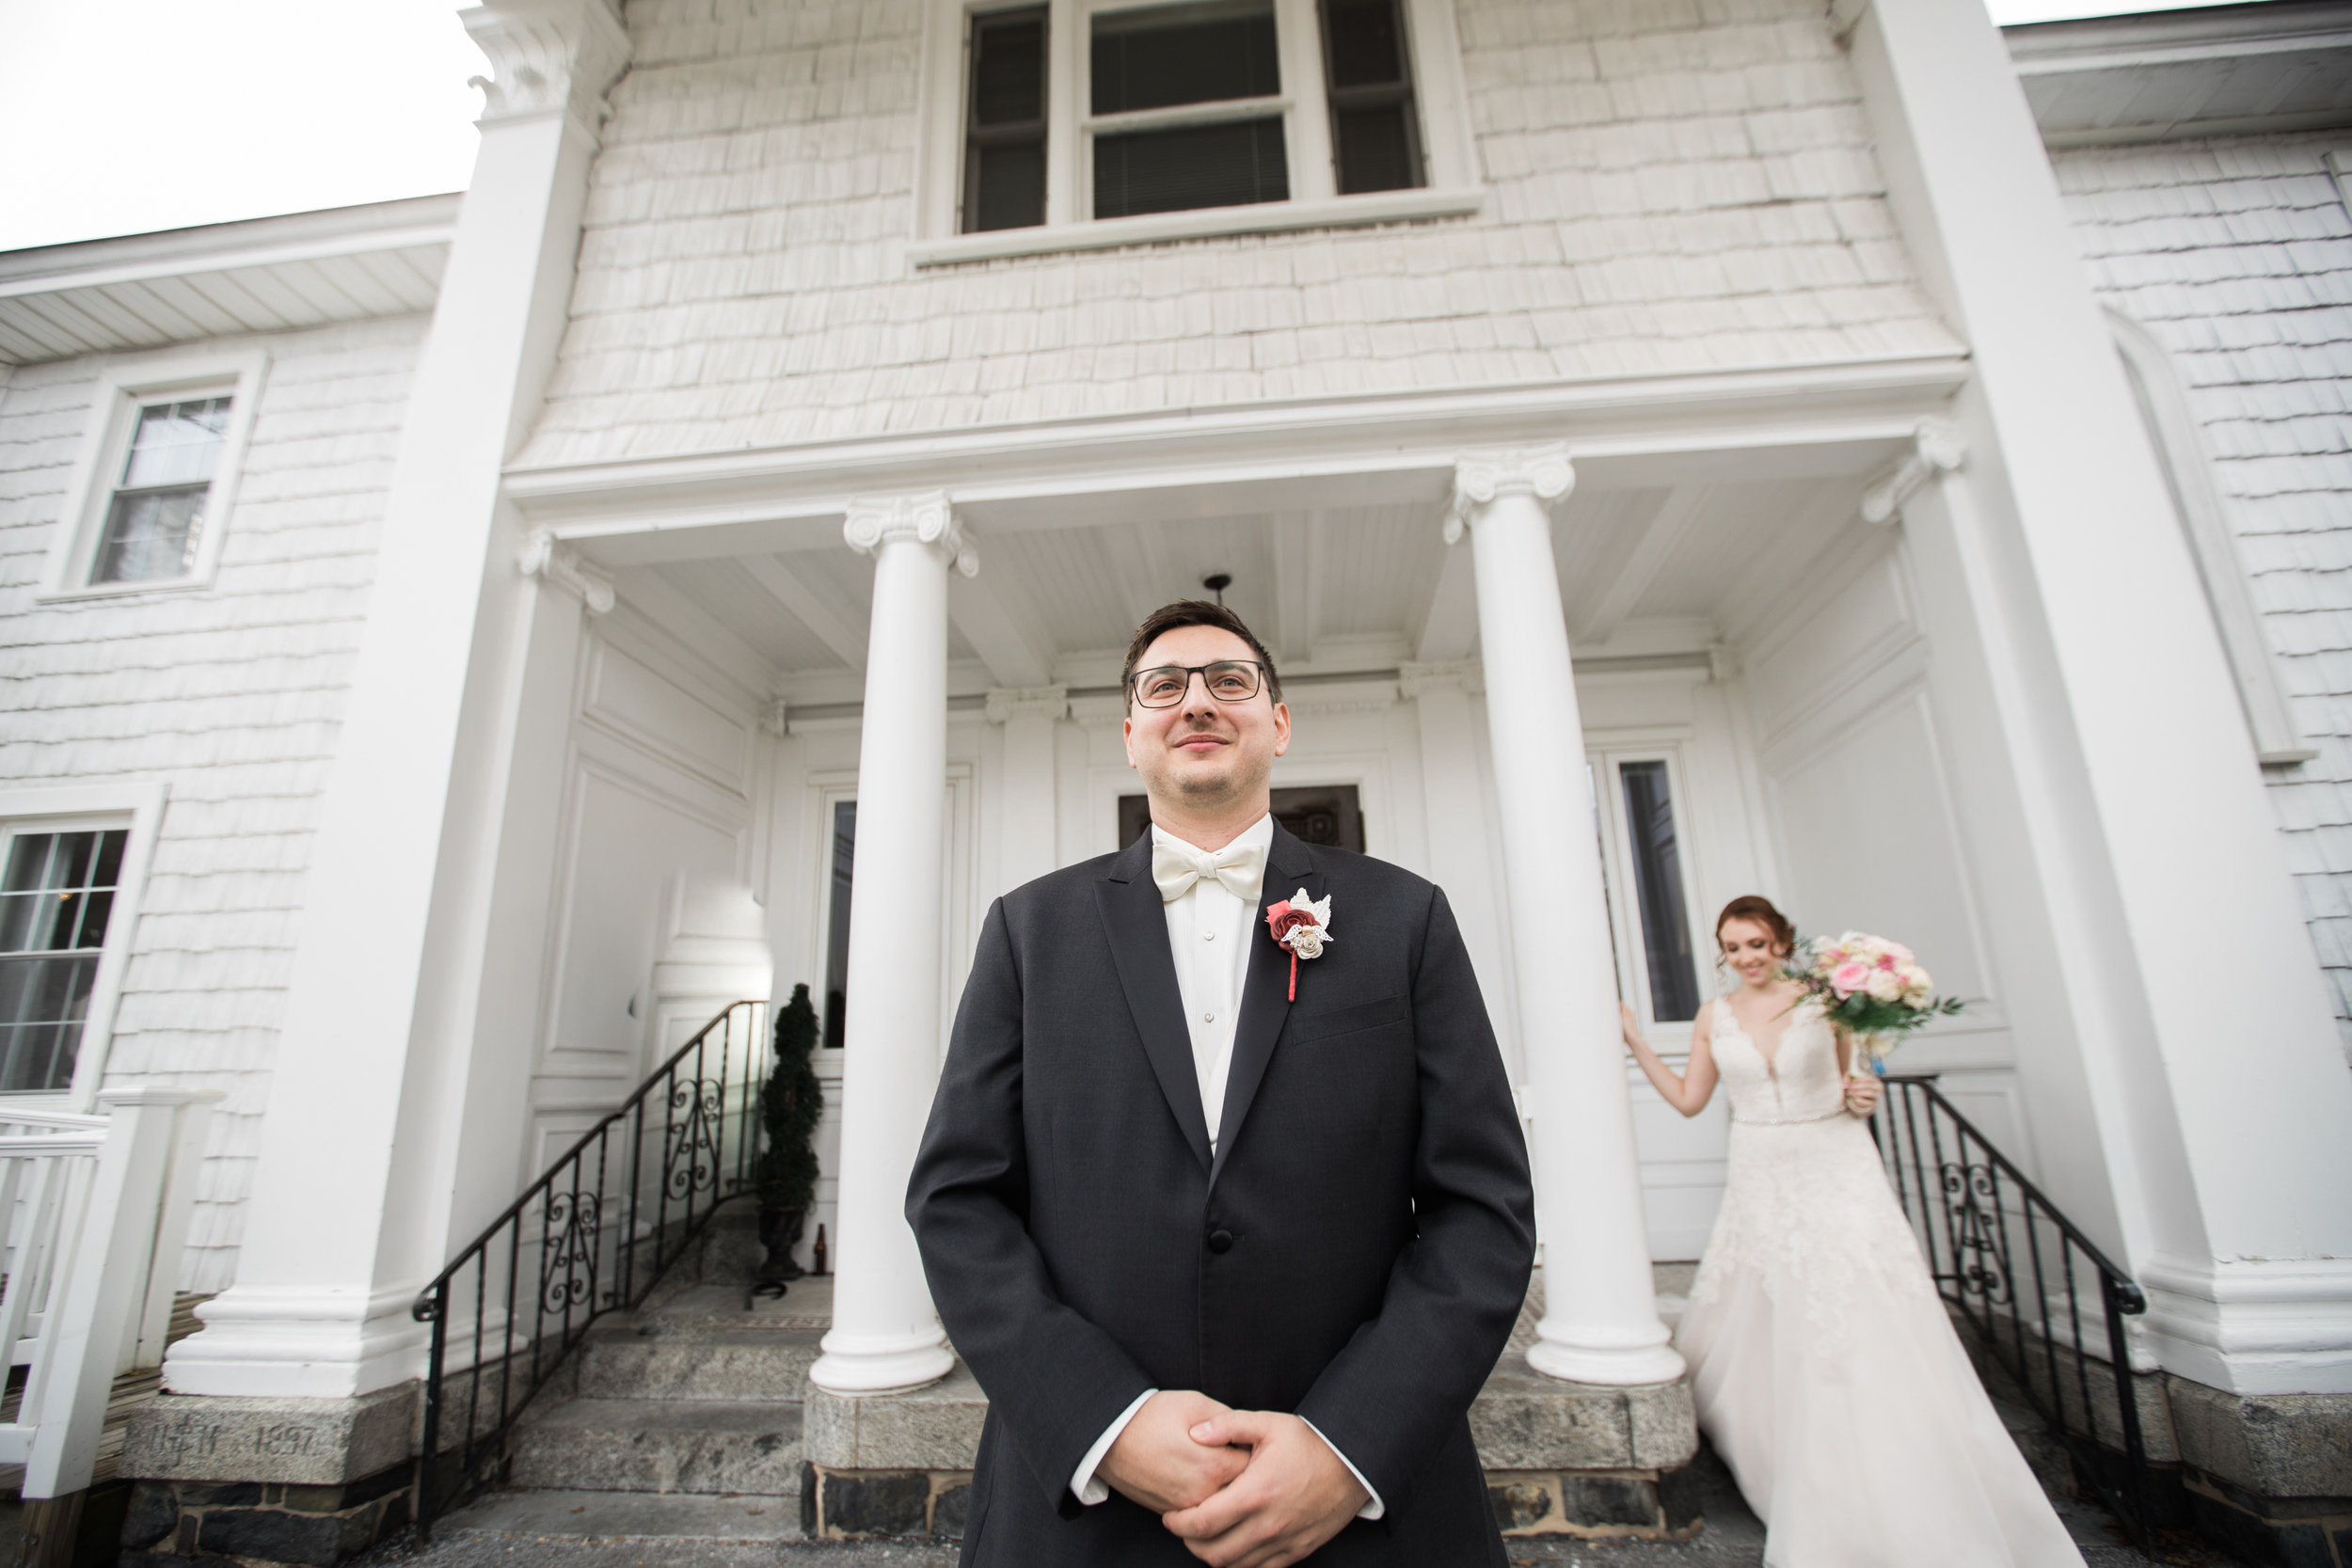 Harry Potter Wedding at Overhills Mansion Catonville Maryland Wedding Photographers Megapixels Media (33 of 134).jpg